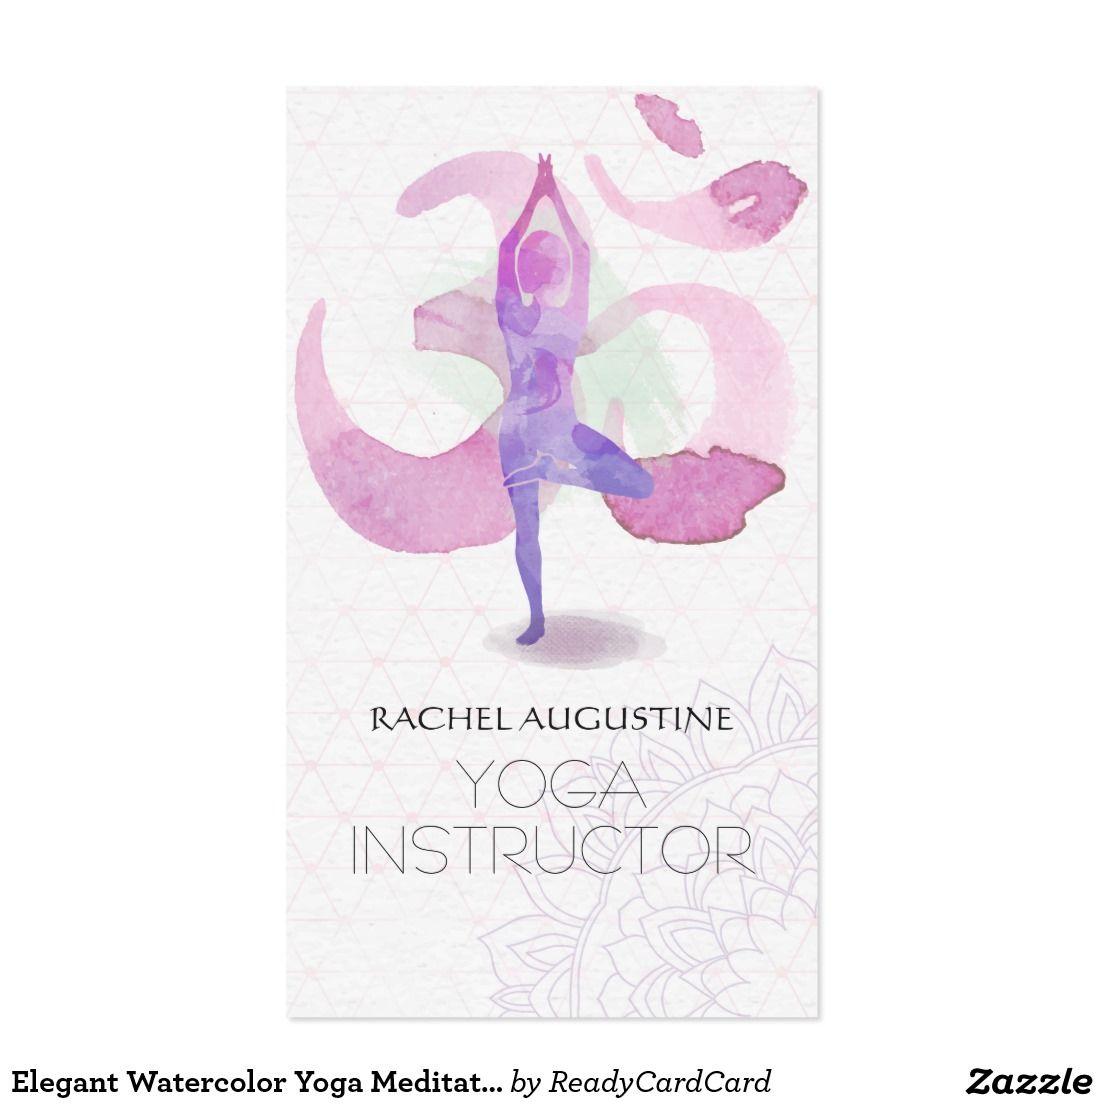 Elegant watercolor yoga meditation pose om symbol business card elegant watercolor yoga meditation pose om symbol business card reheart Image collections